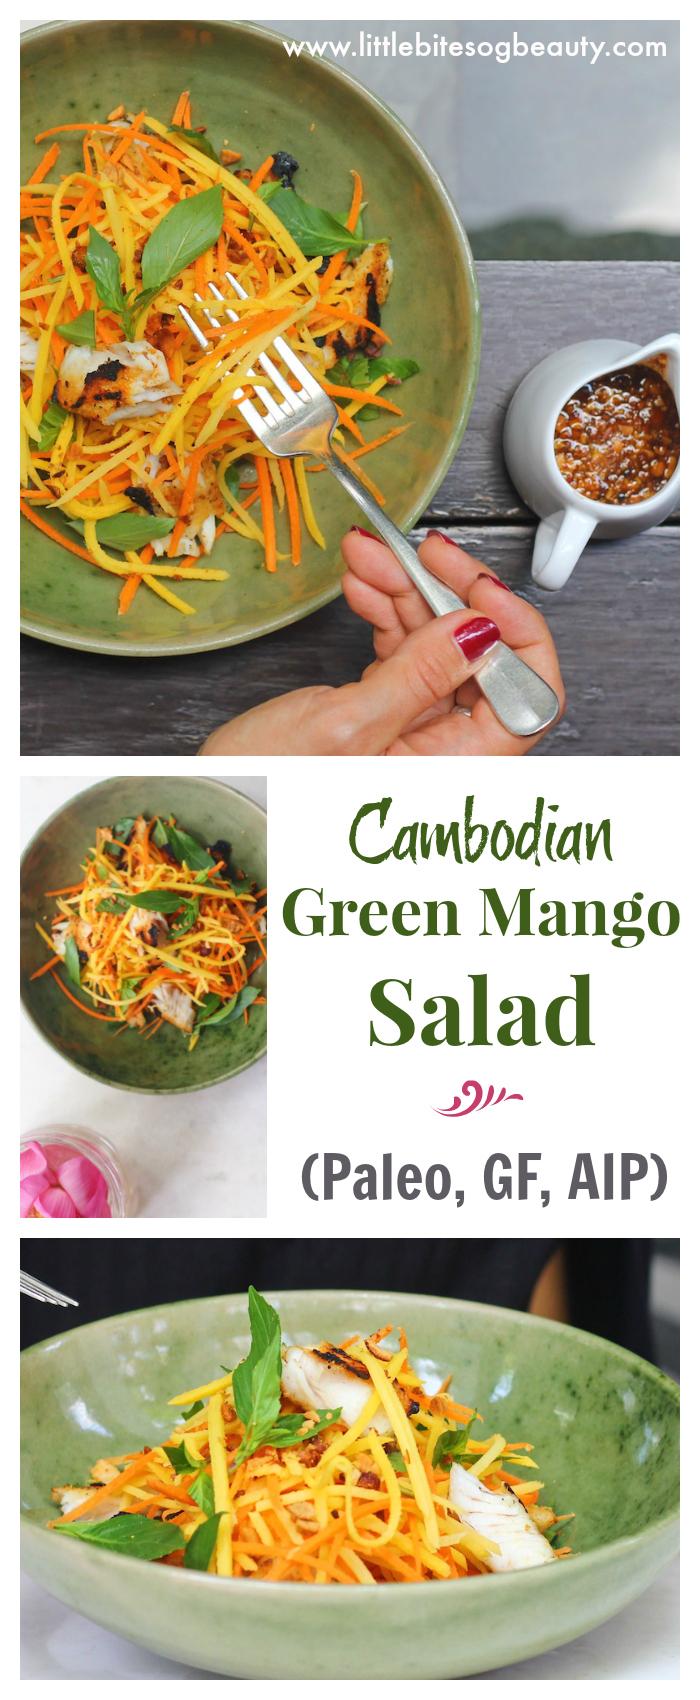 Green Mango Salad (Paleo, GF, AIP)